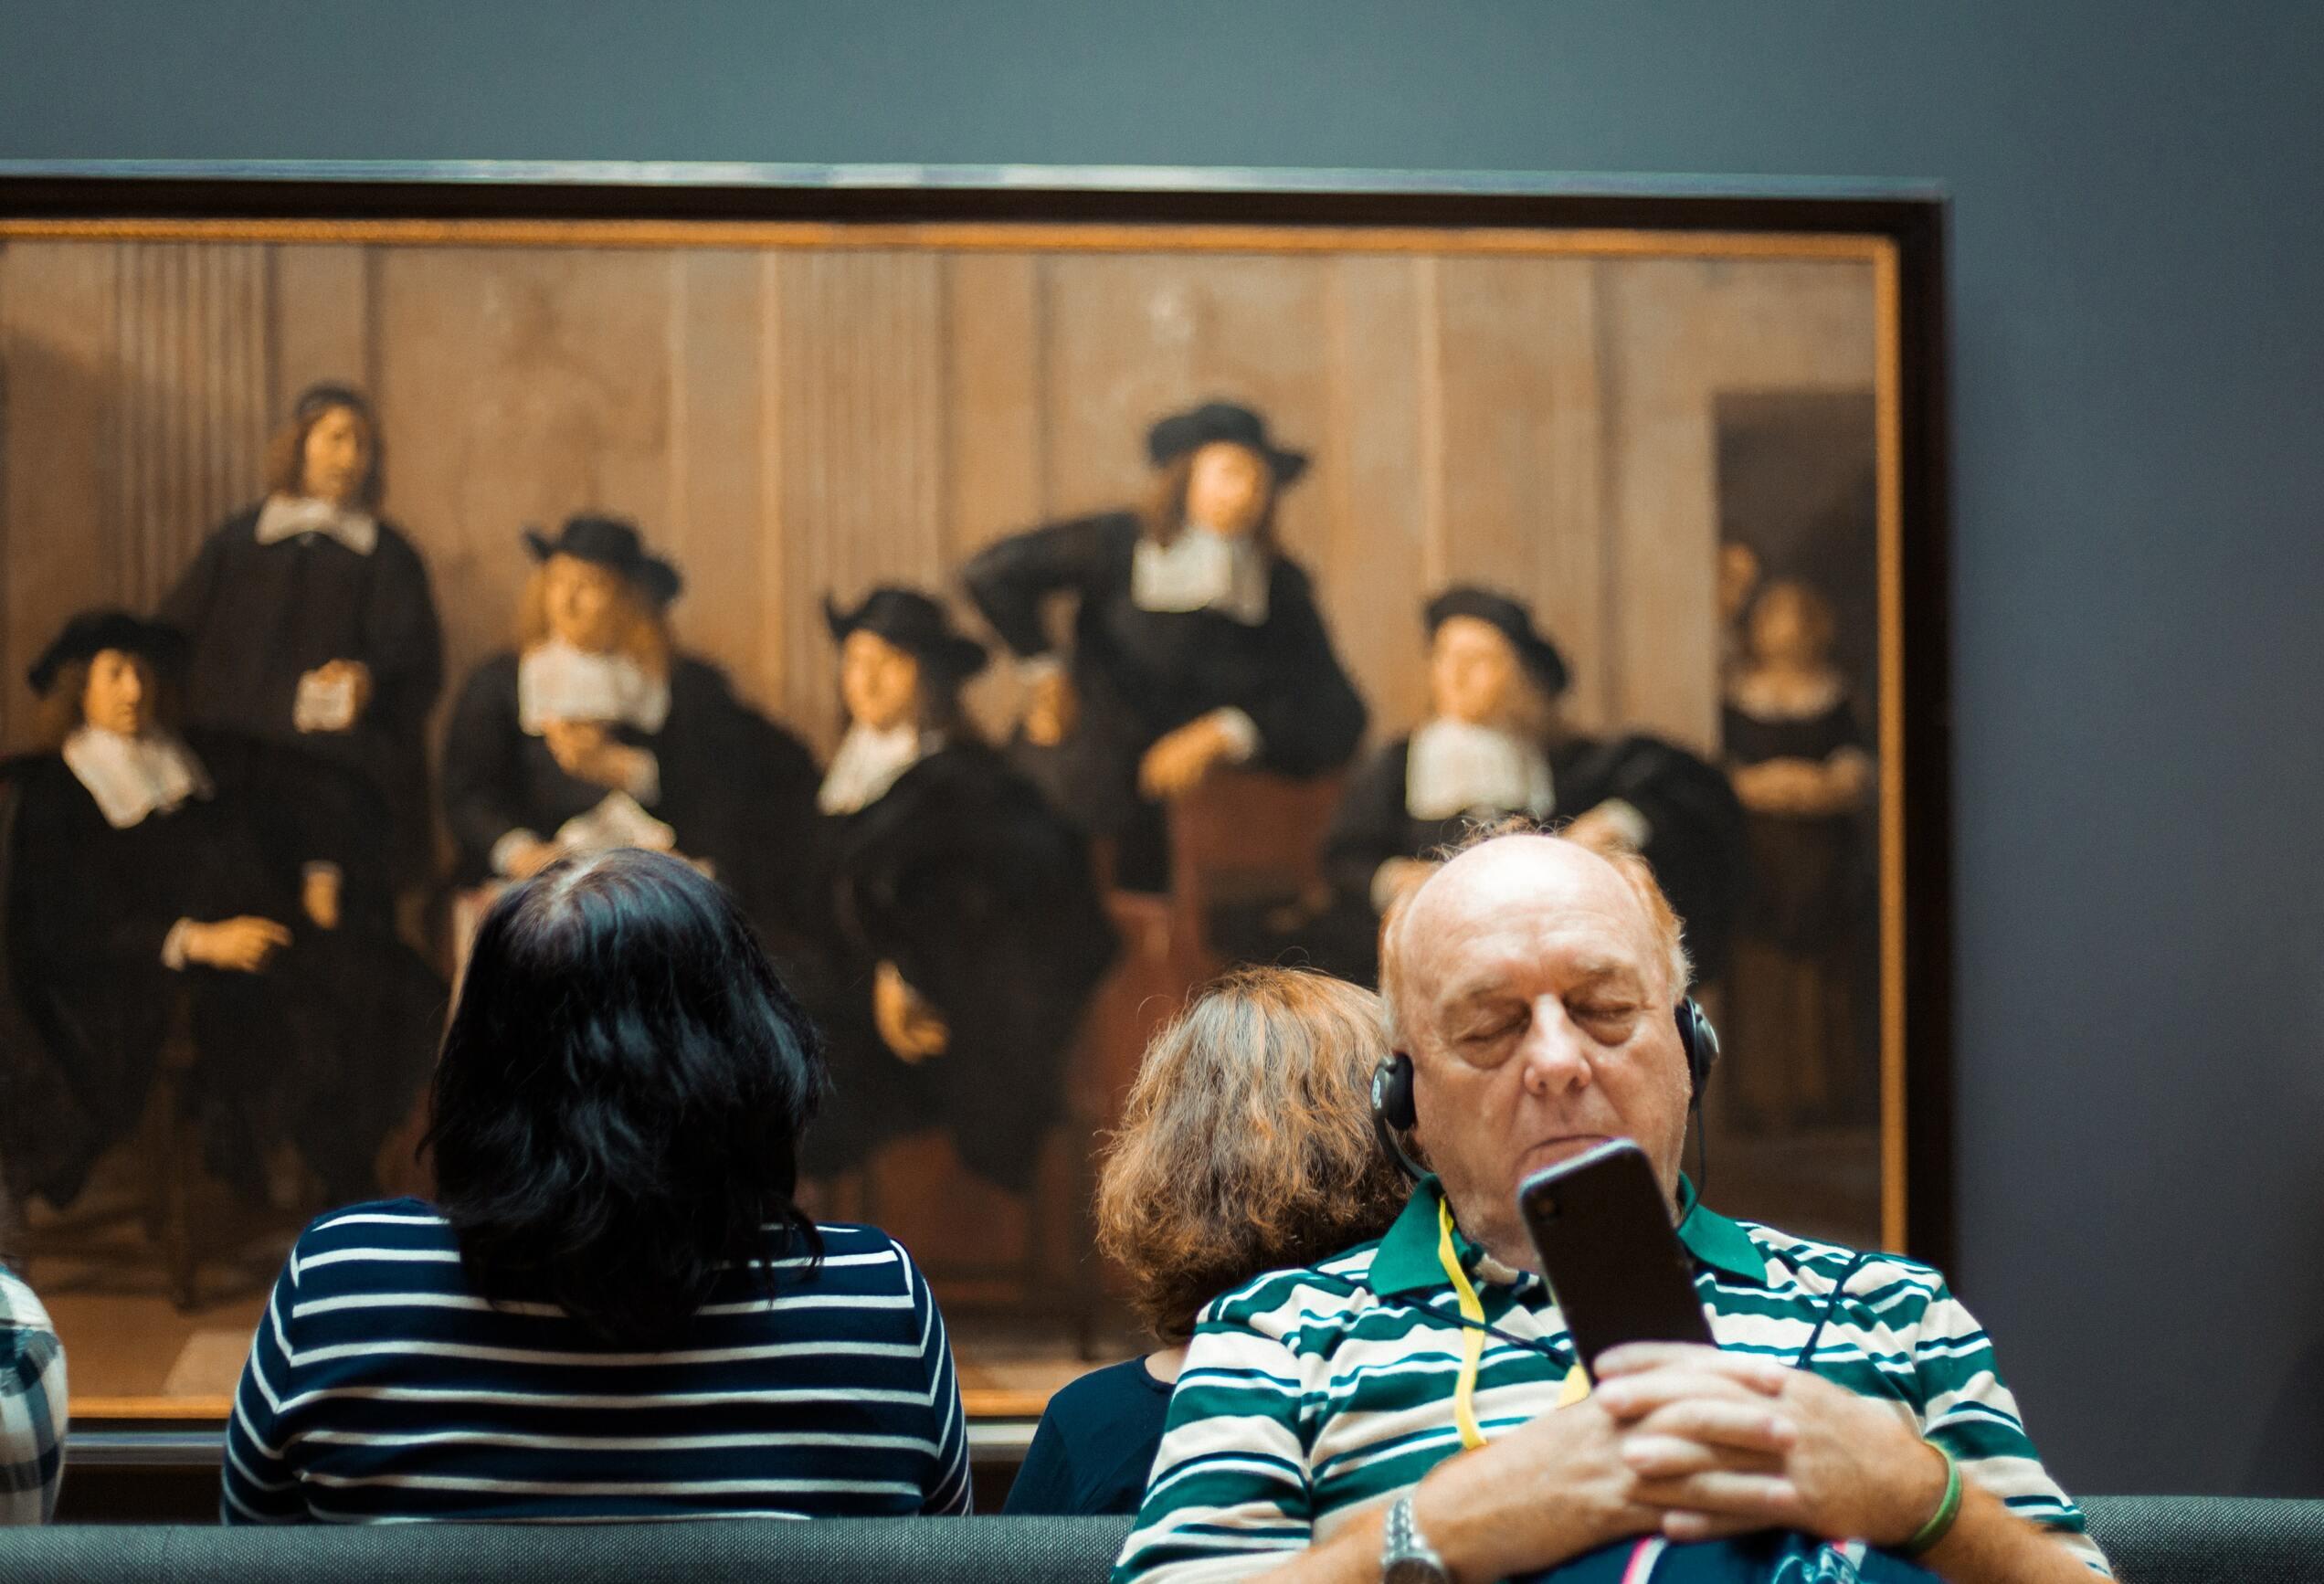 Musées_Amsterdam_Amsterdam tickets Rijksmuseum